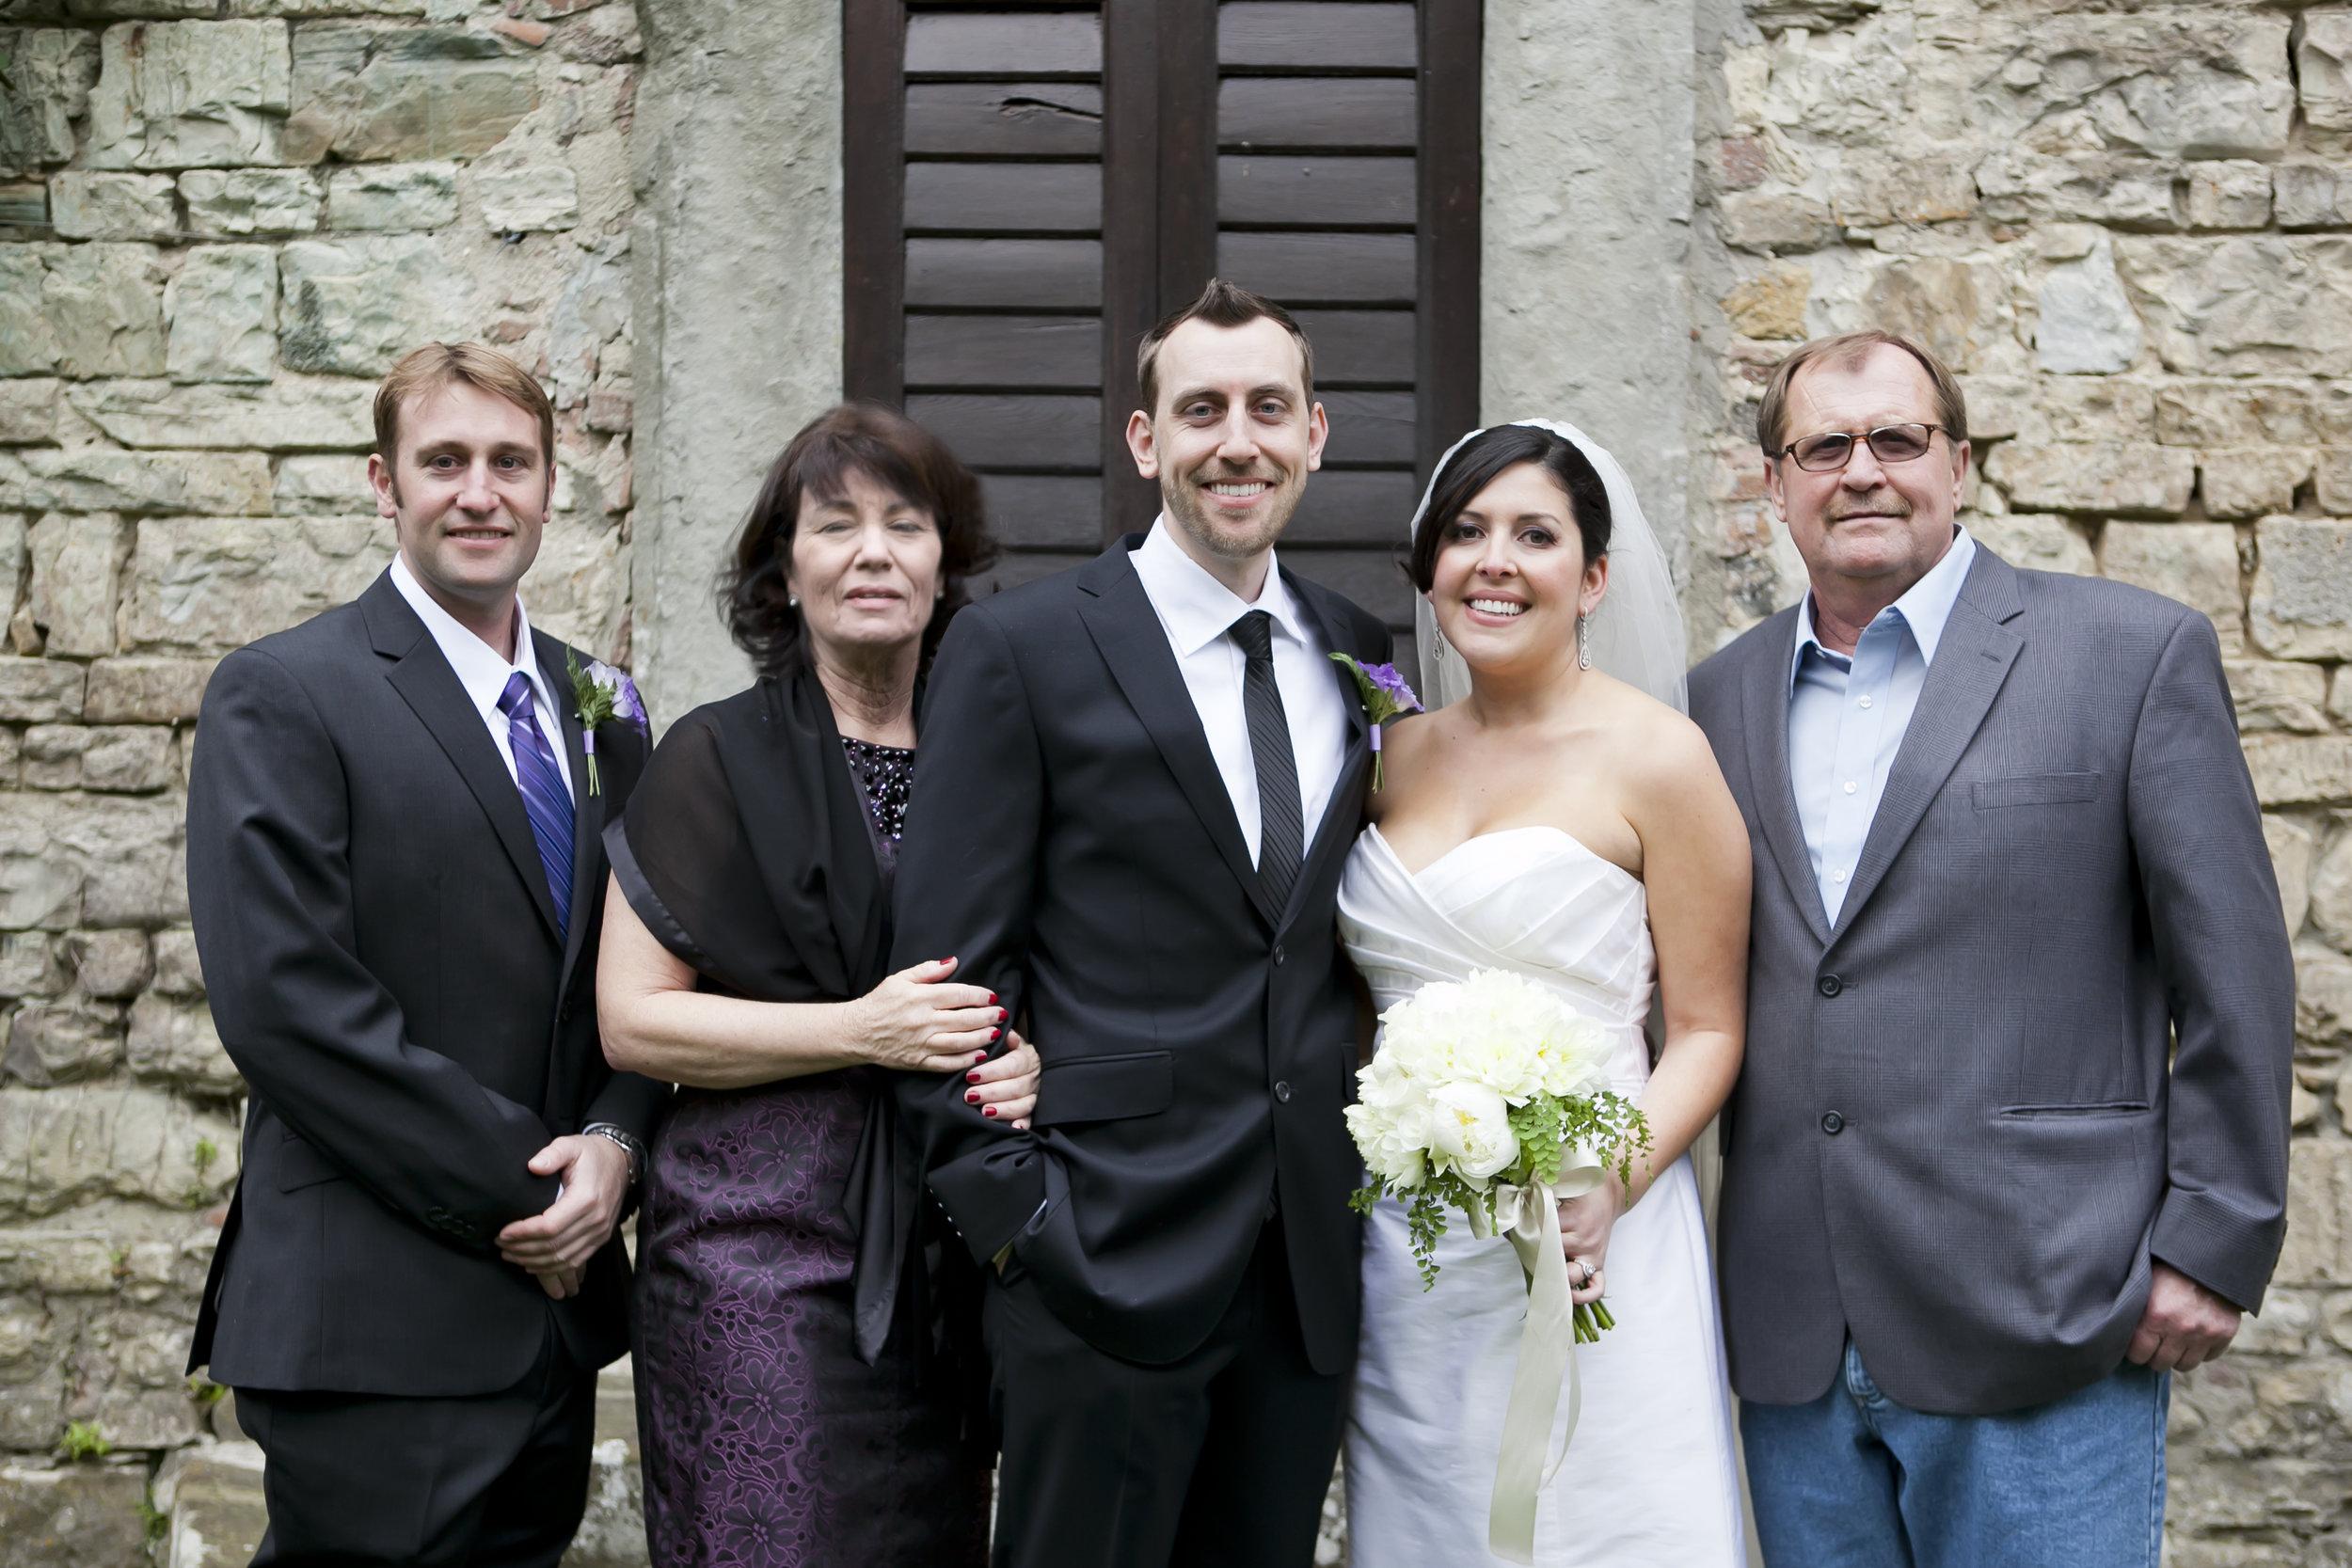 Wedding day with Jordan's family